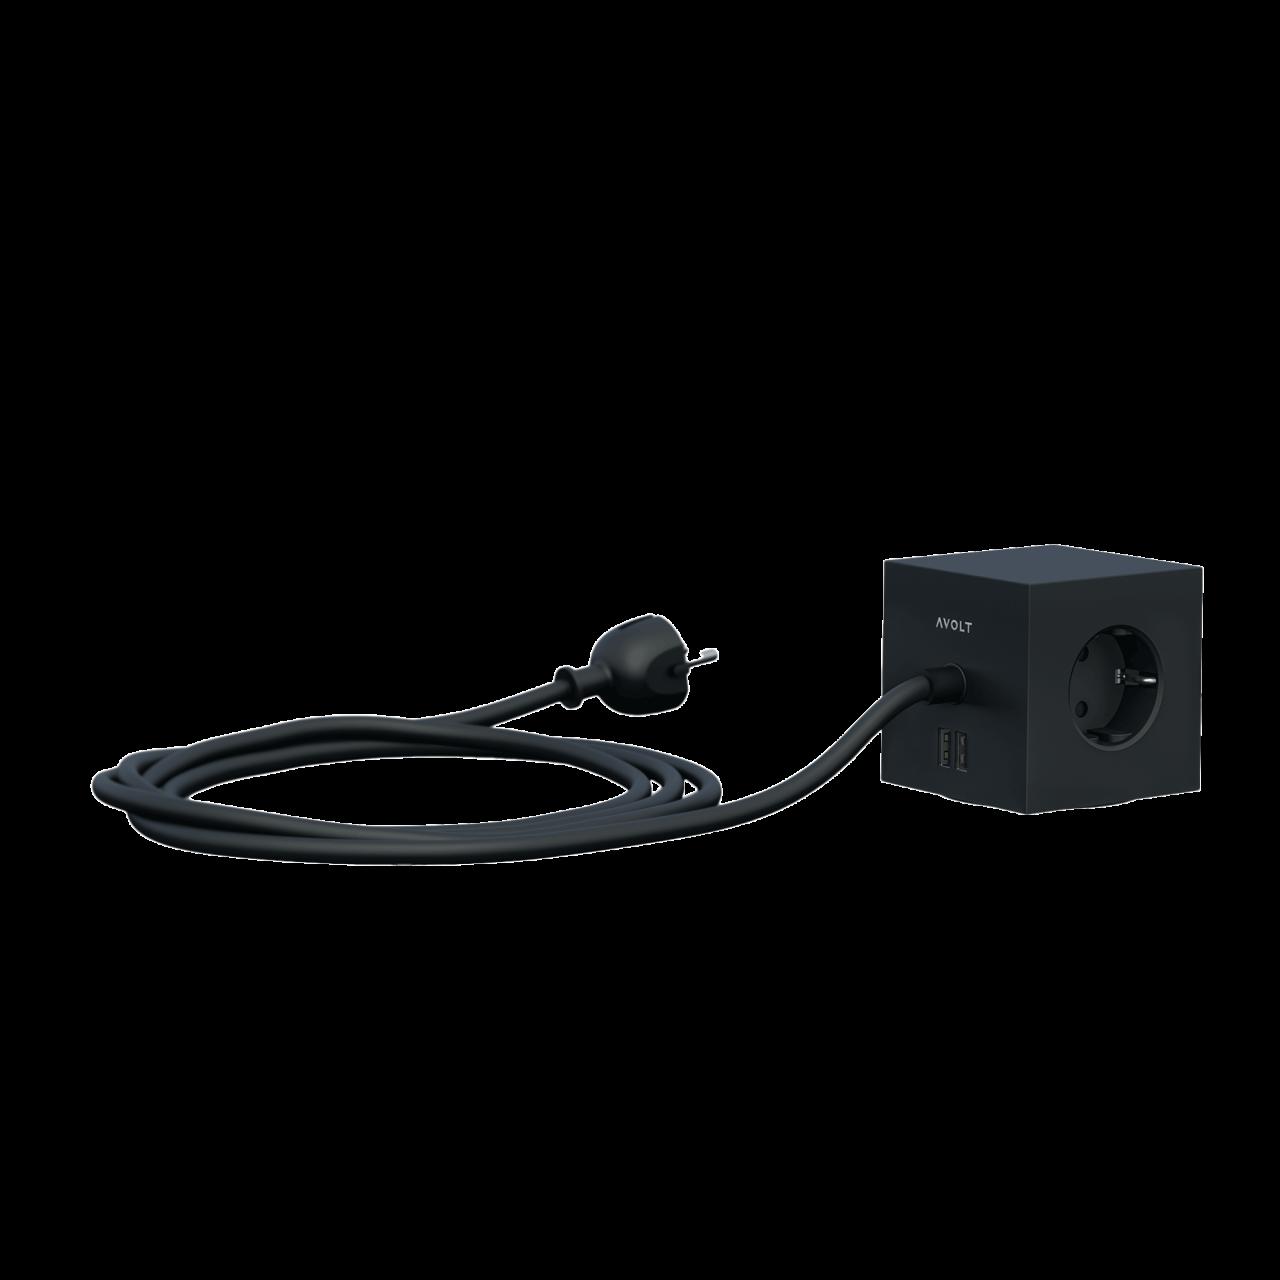 Square 1 USB+Schuko Mehrfachsteckdose